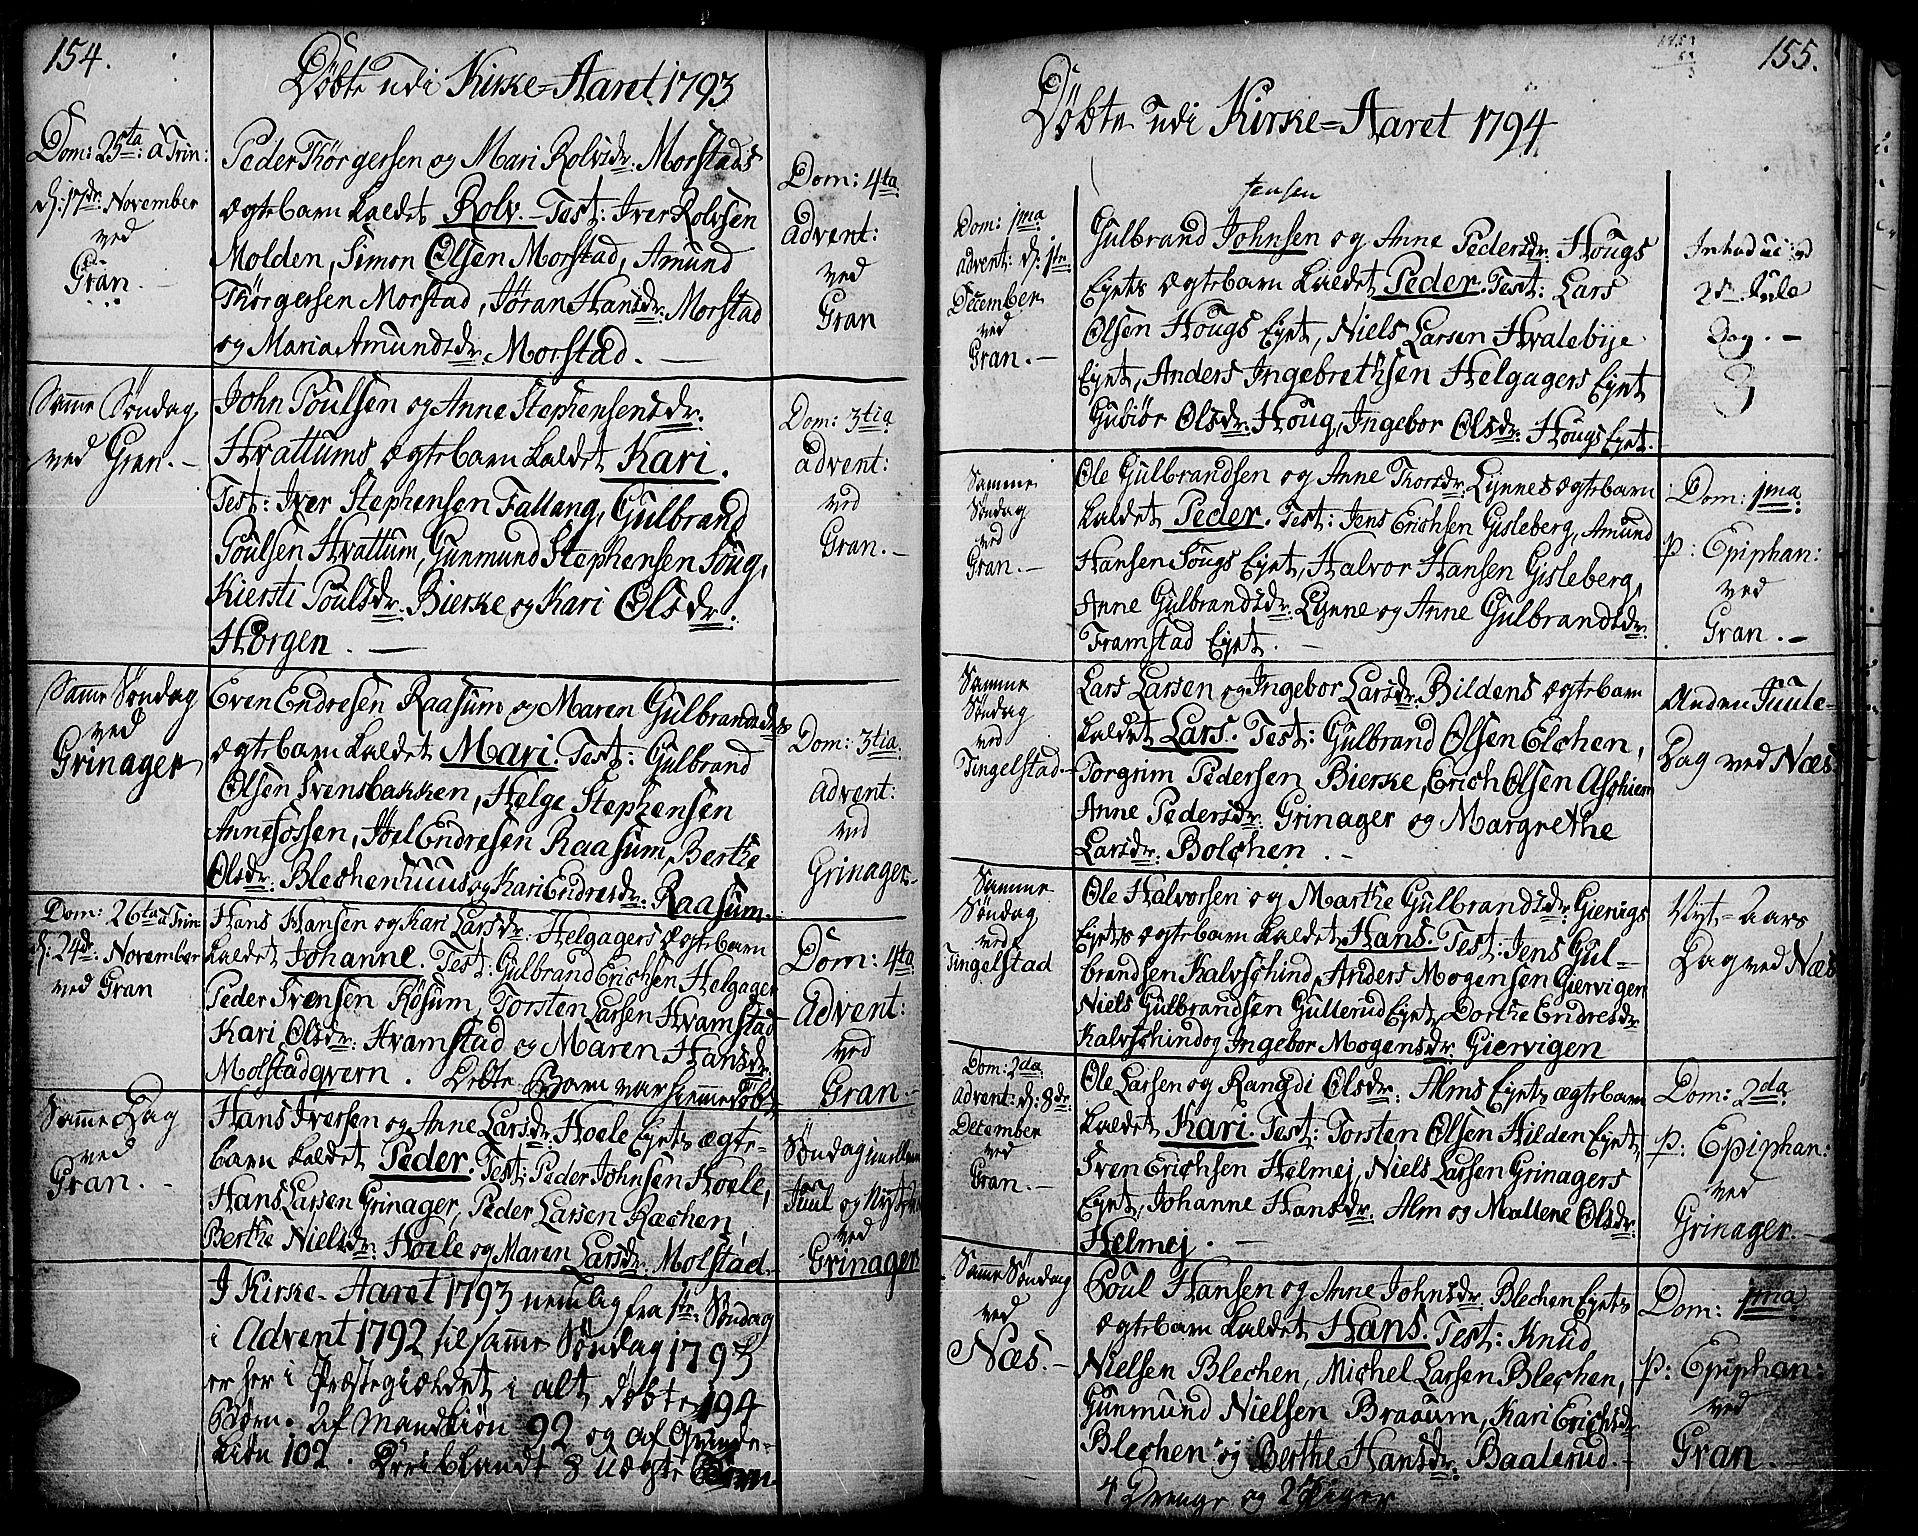 SAH, Gran prestekontor, Ministerialbok nr. 6, 1787-1824, s. 154-155